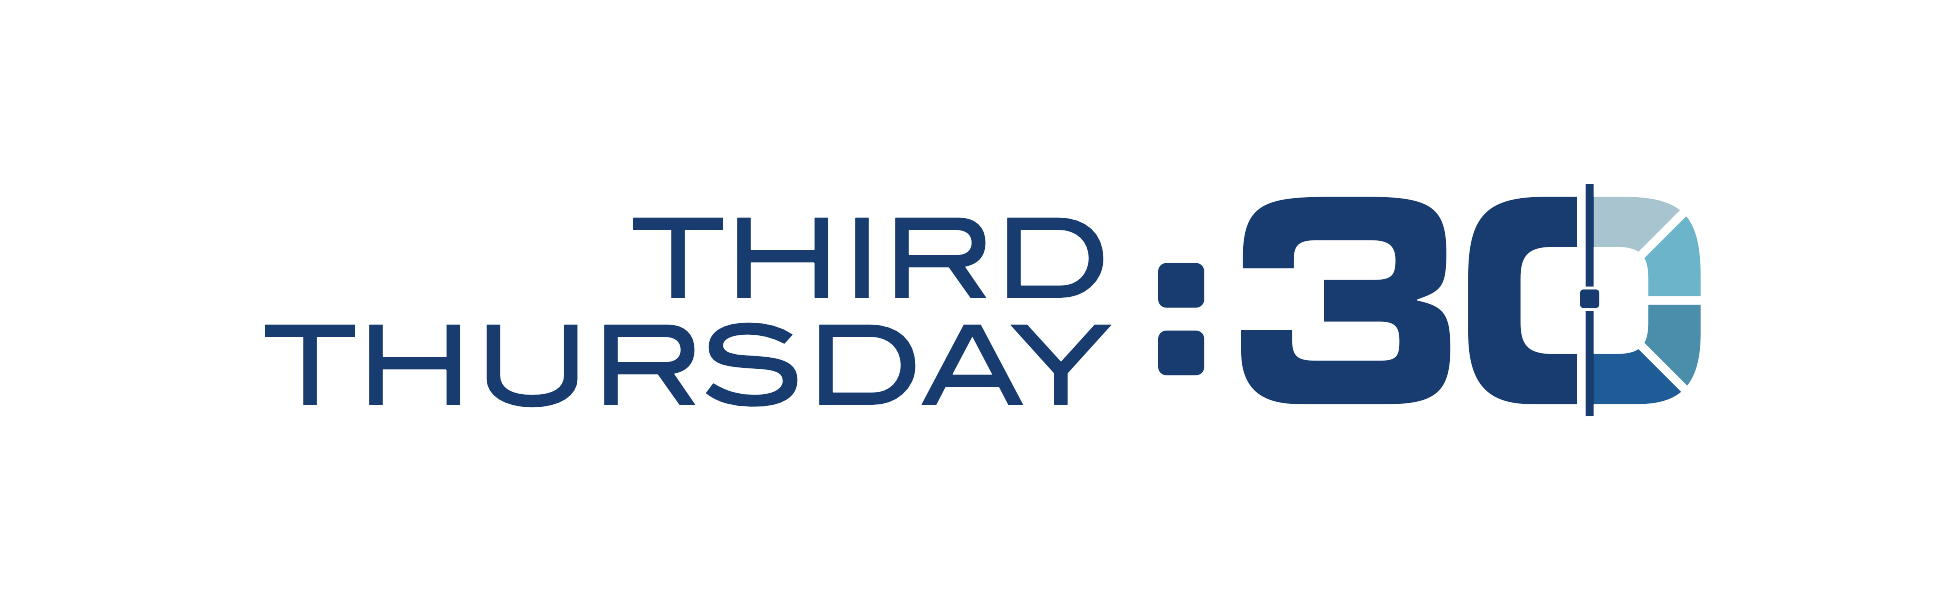 Third Thursday 30 podcast show art